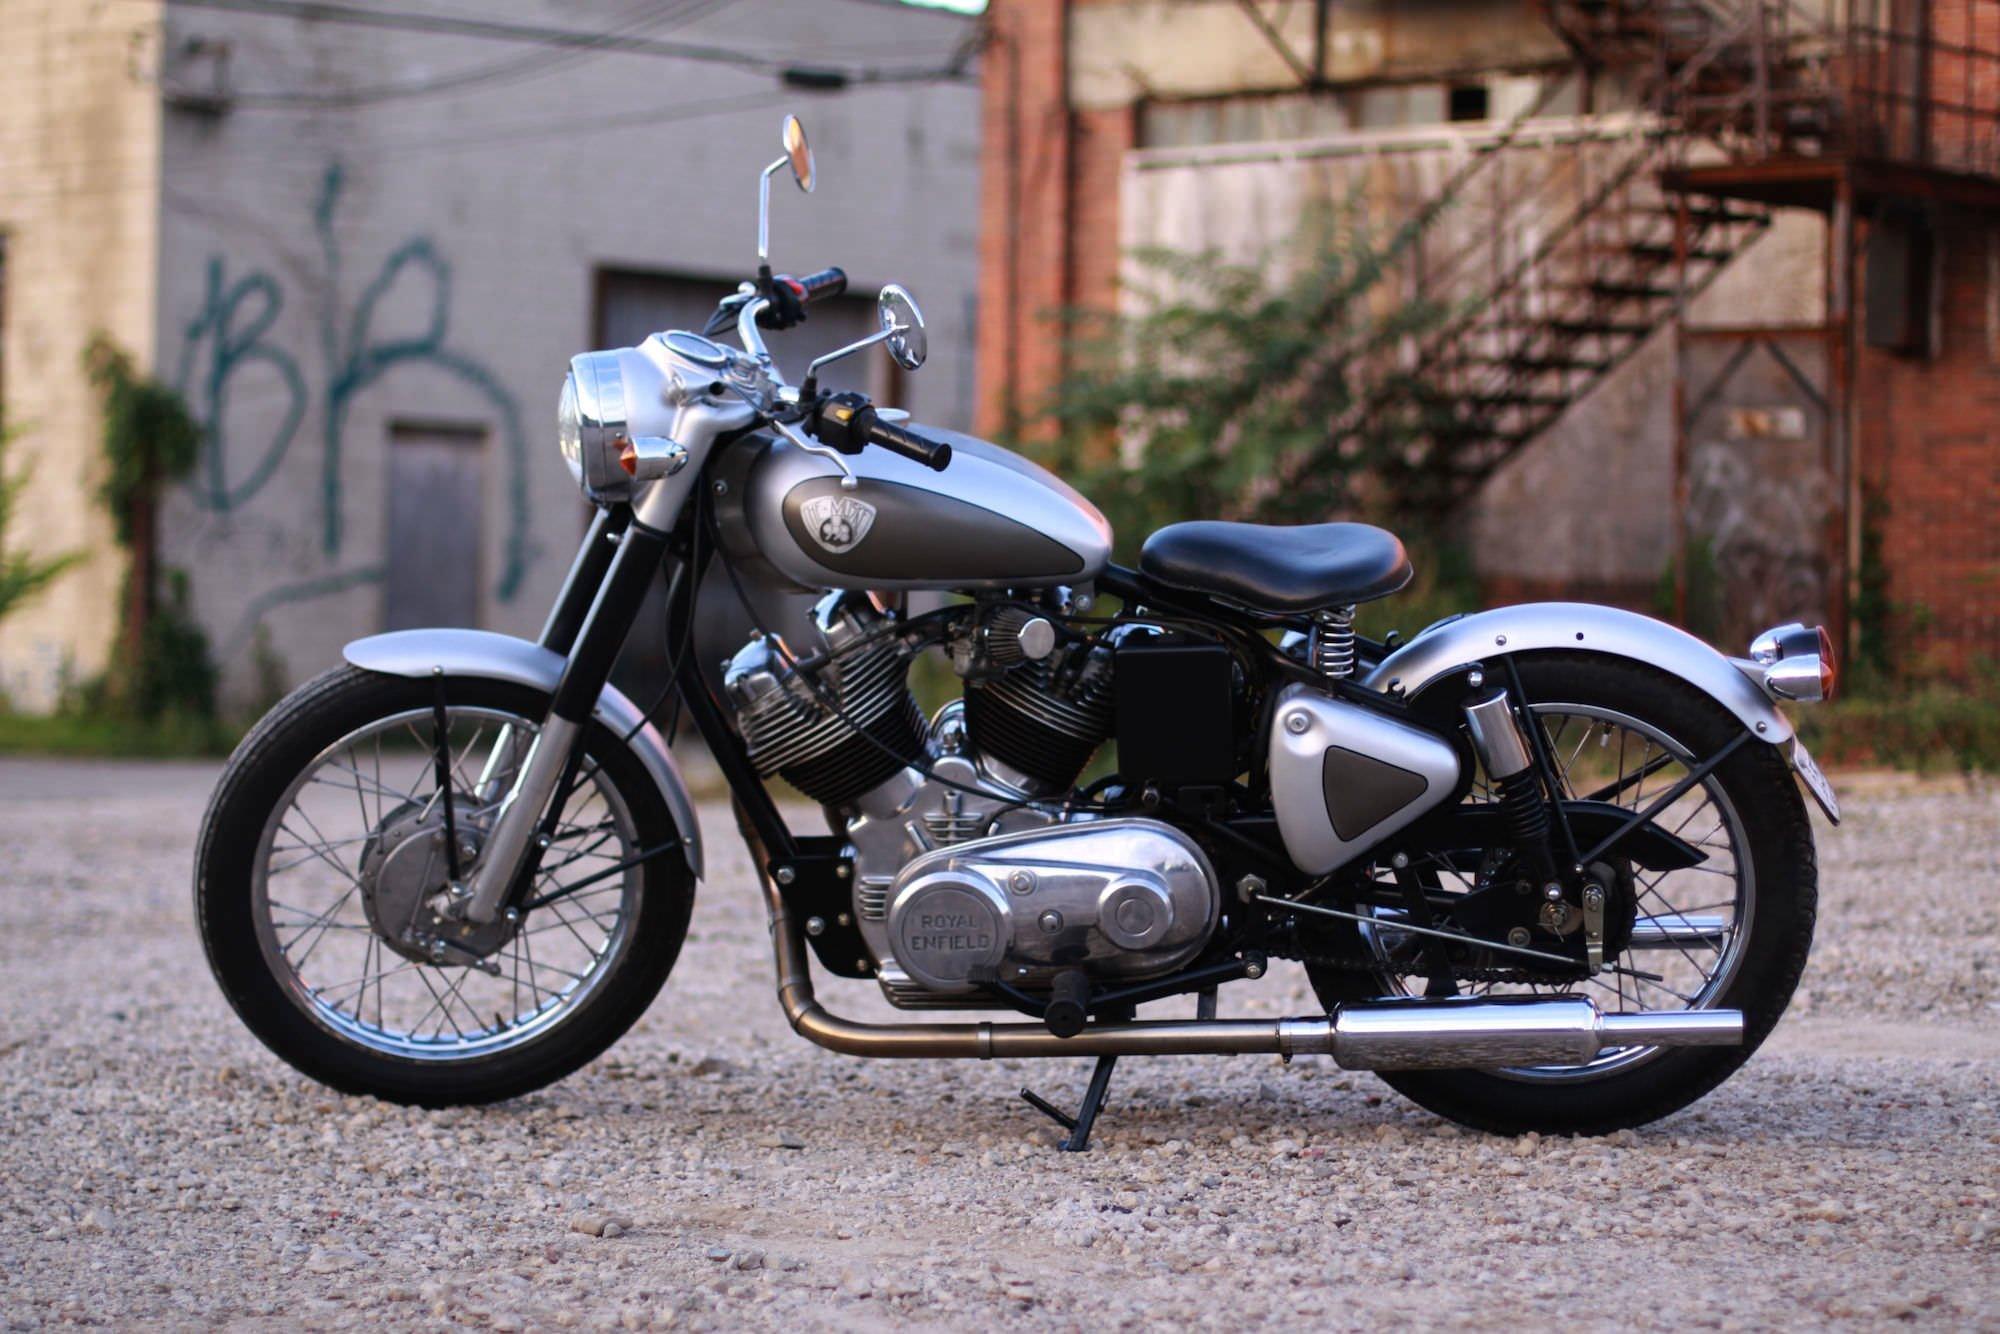 Cc Yamaha Engines For Sale